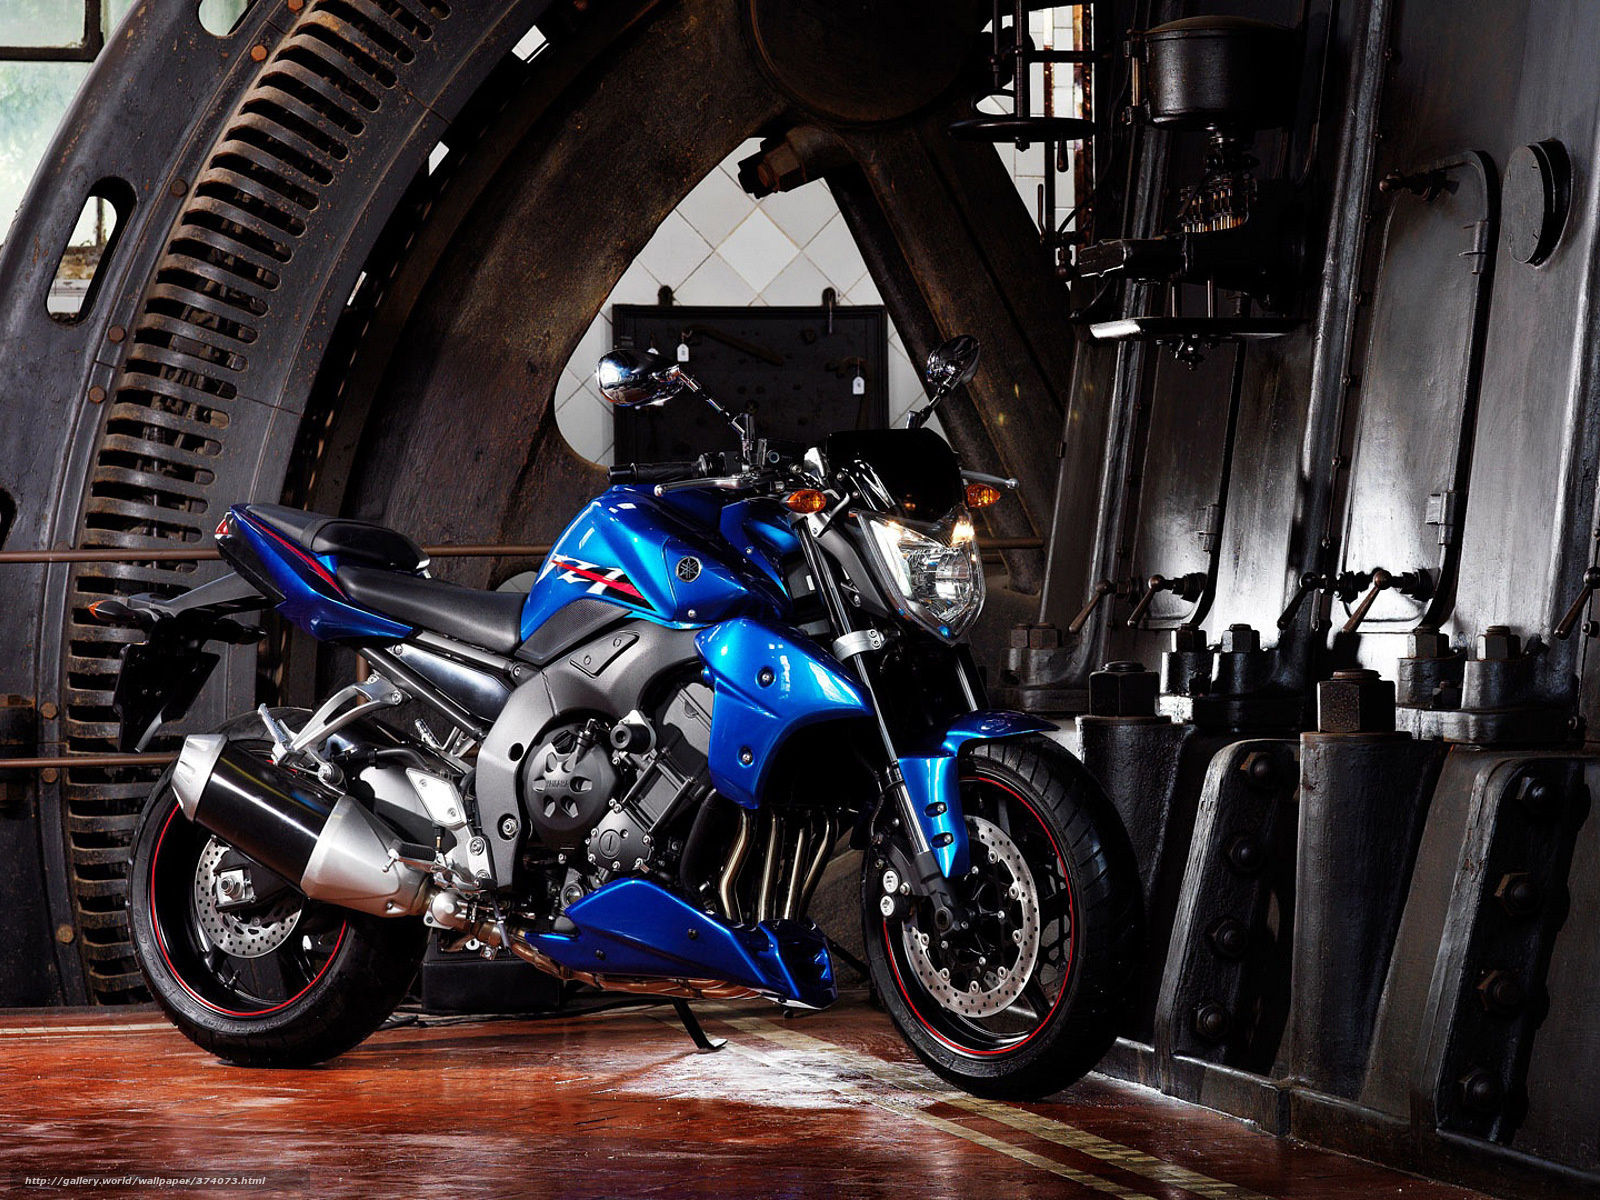 Tlcharger fond d 39 ecran yamaha moto mcanisme voitures for Garage moto marseille